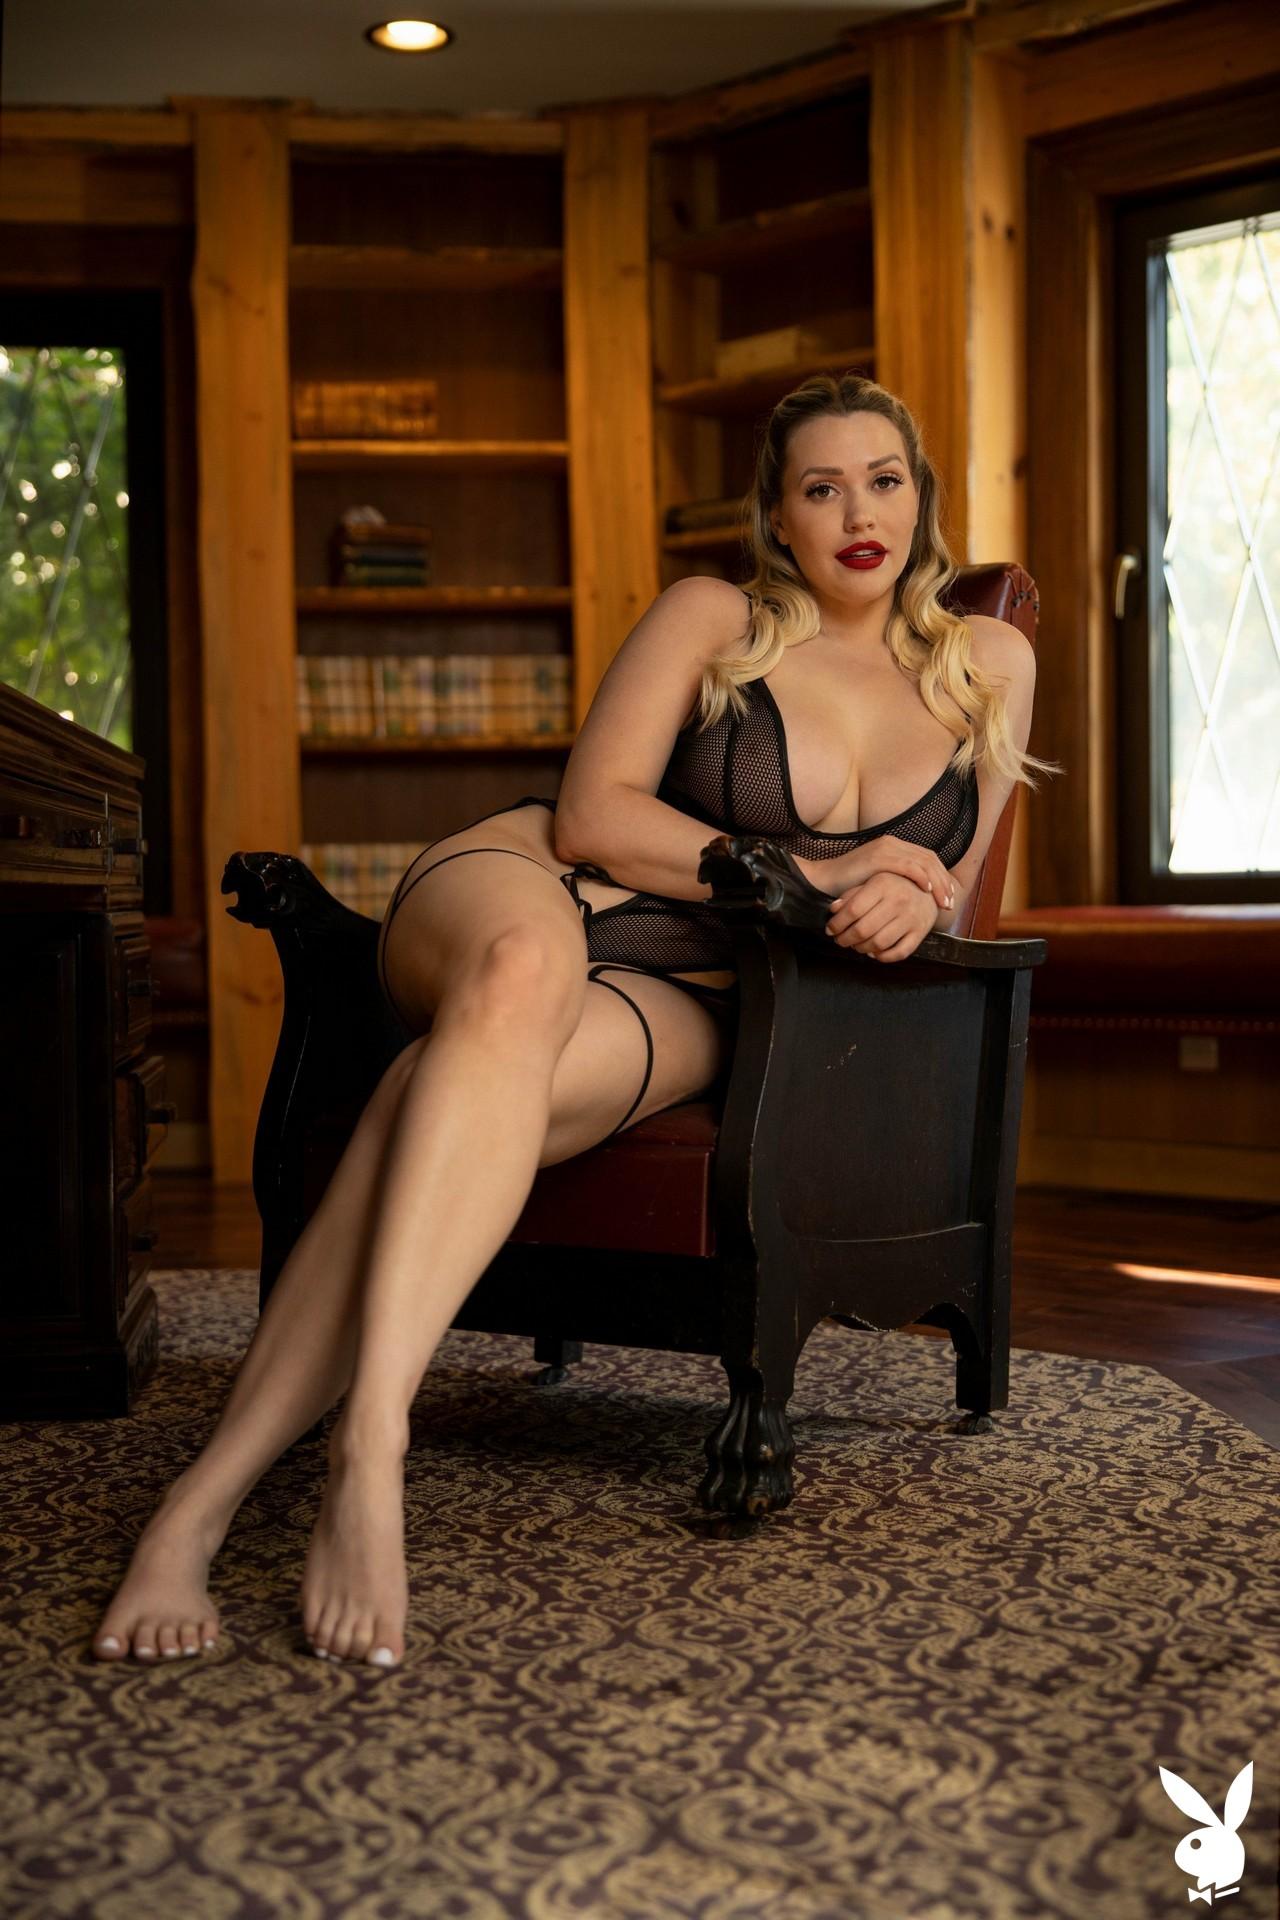 Mia Malkova In Off The Clock Playboy Plus (28)